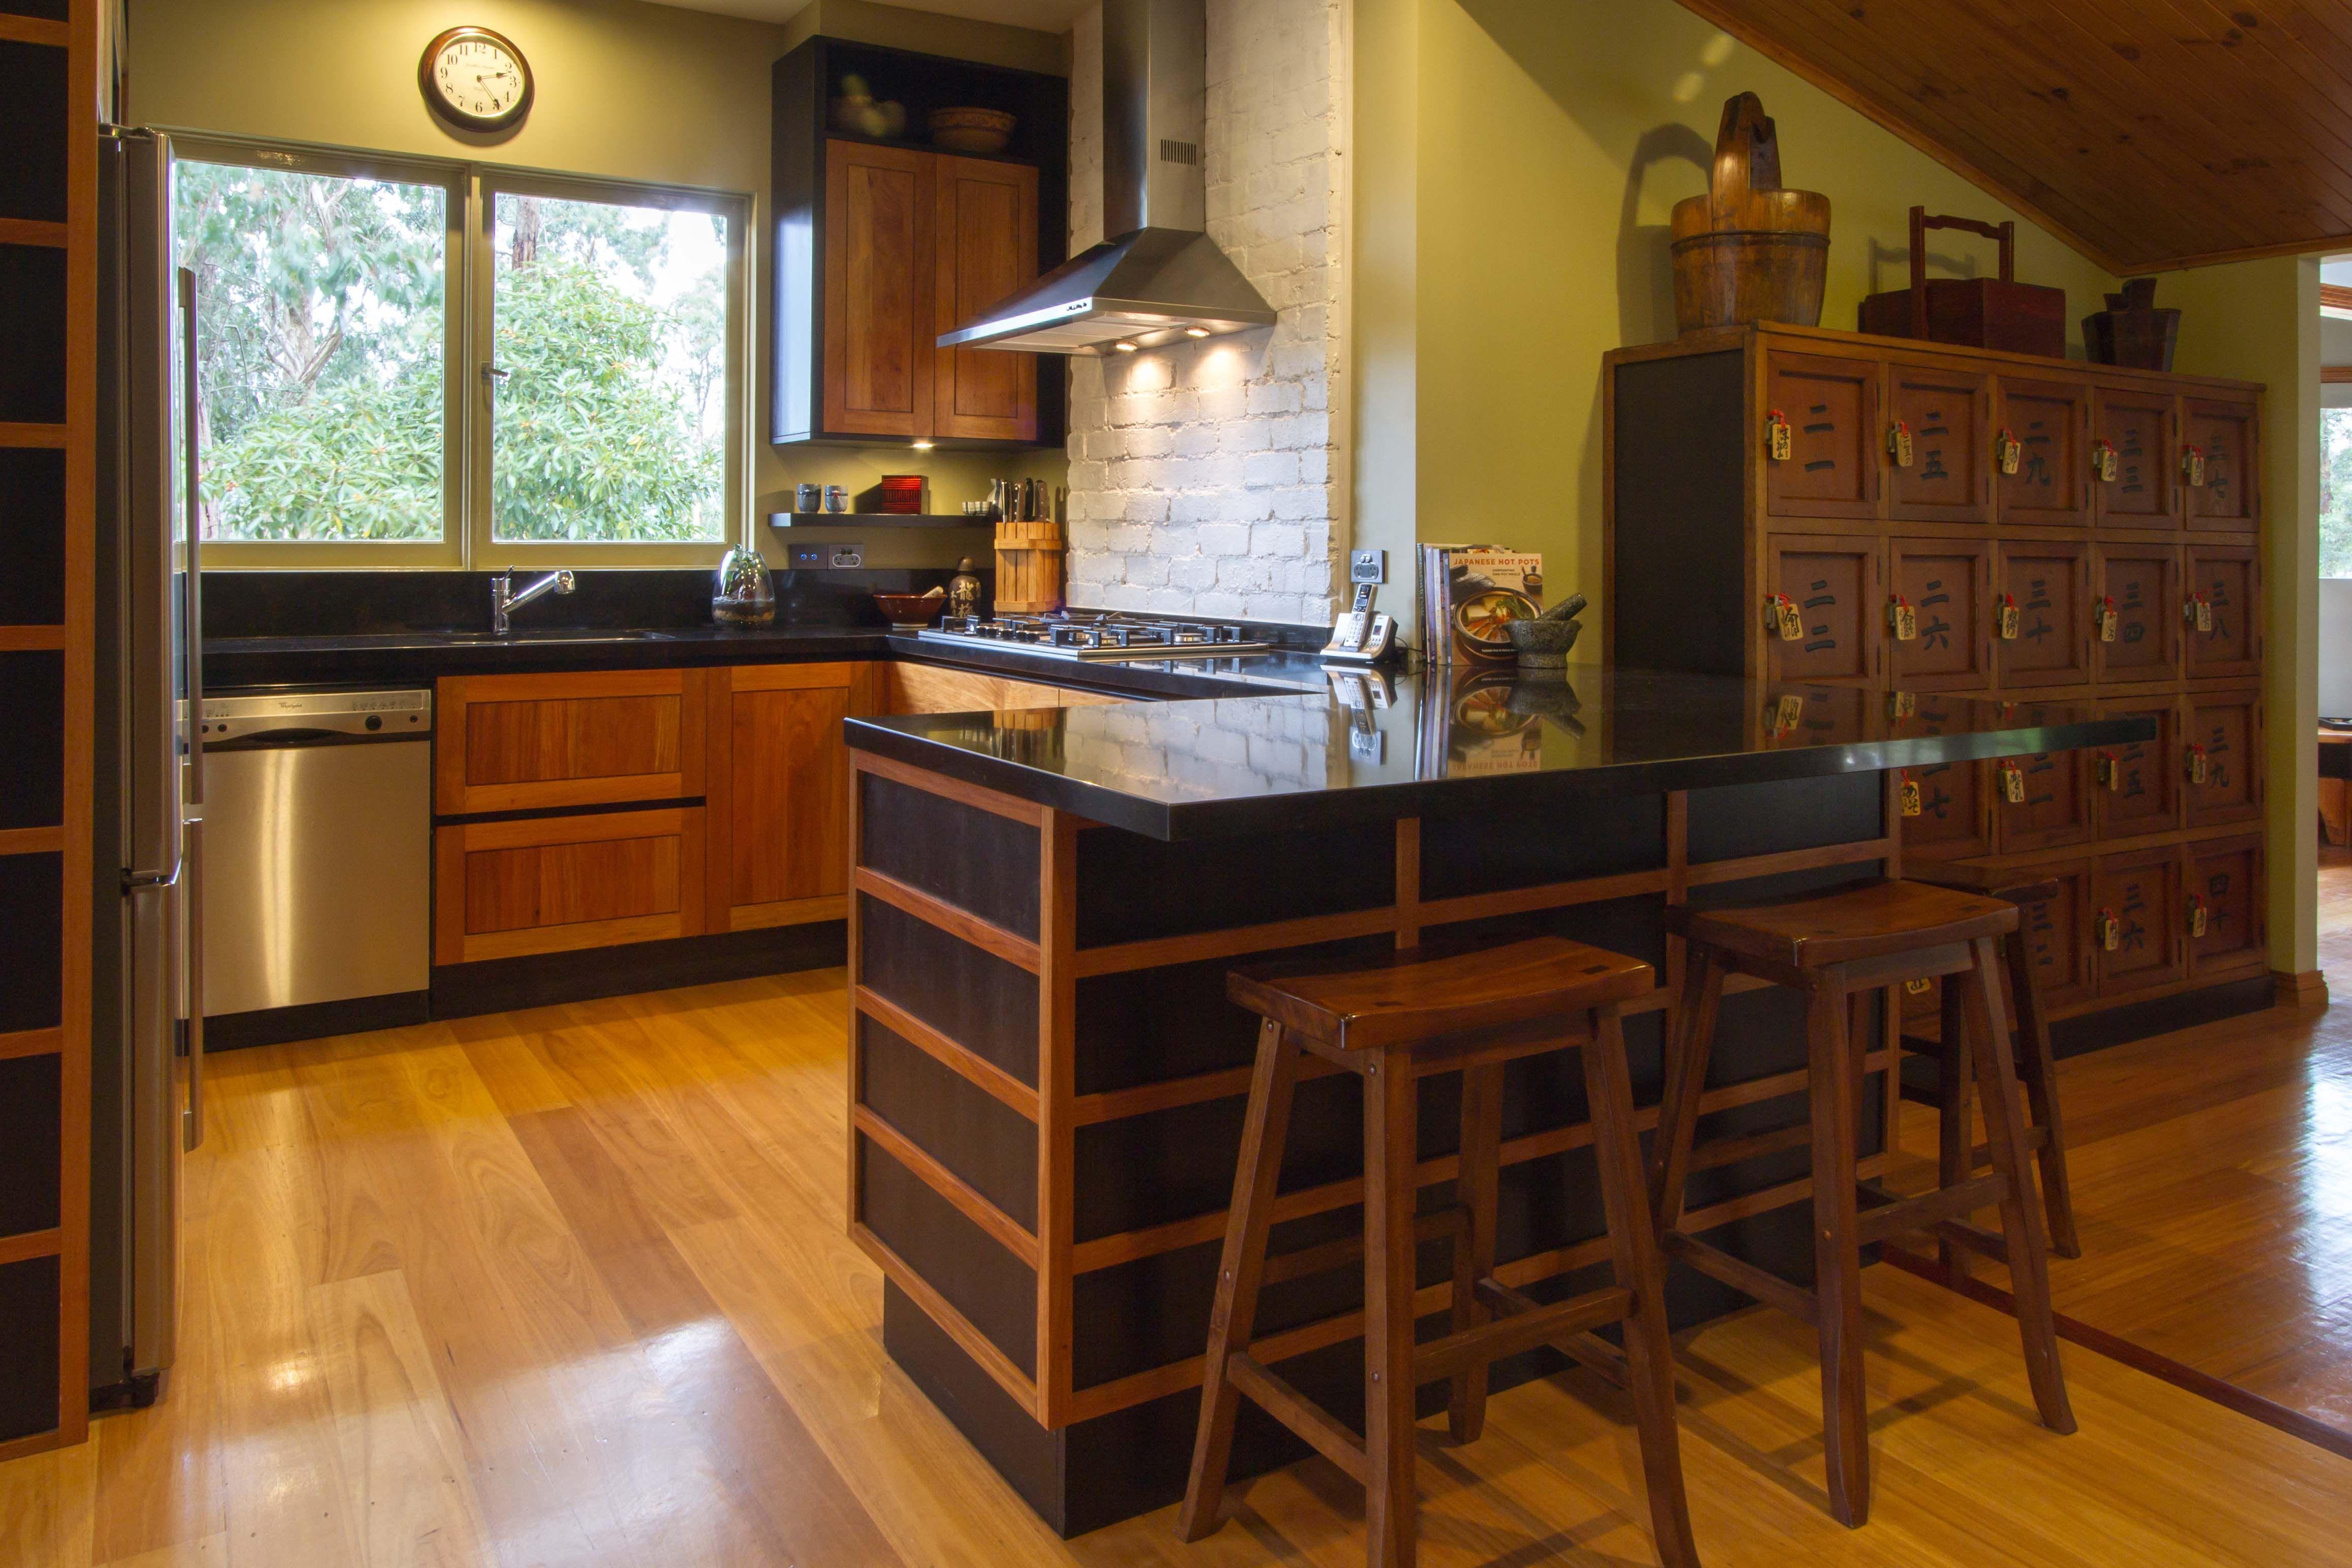 Stunning Japanese Timber Kitchen Www Thekitchendesigncentre Com Au Thekitchen Designcentr Kitchen Design Small Kitchen Design Pictures Kitchen Design Centre